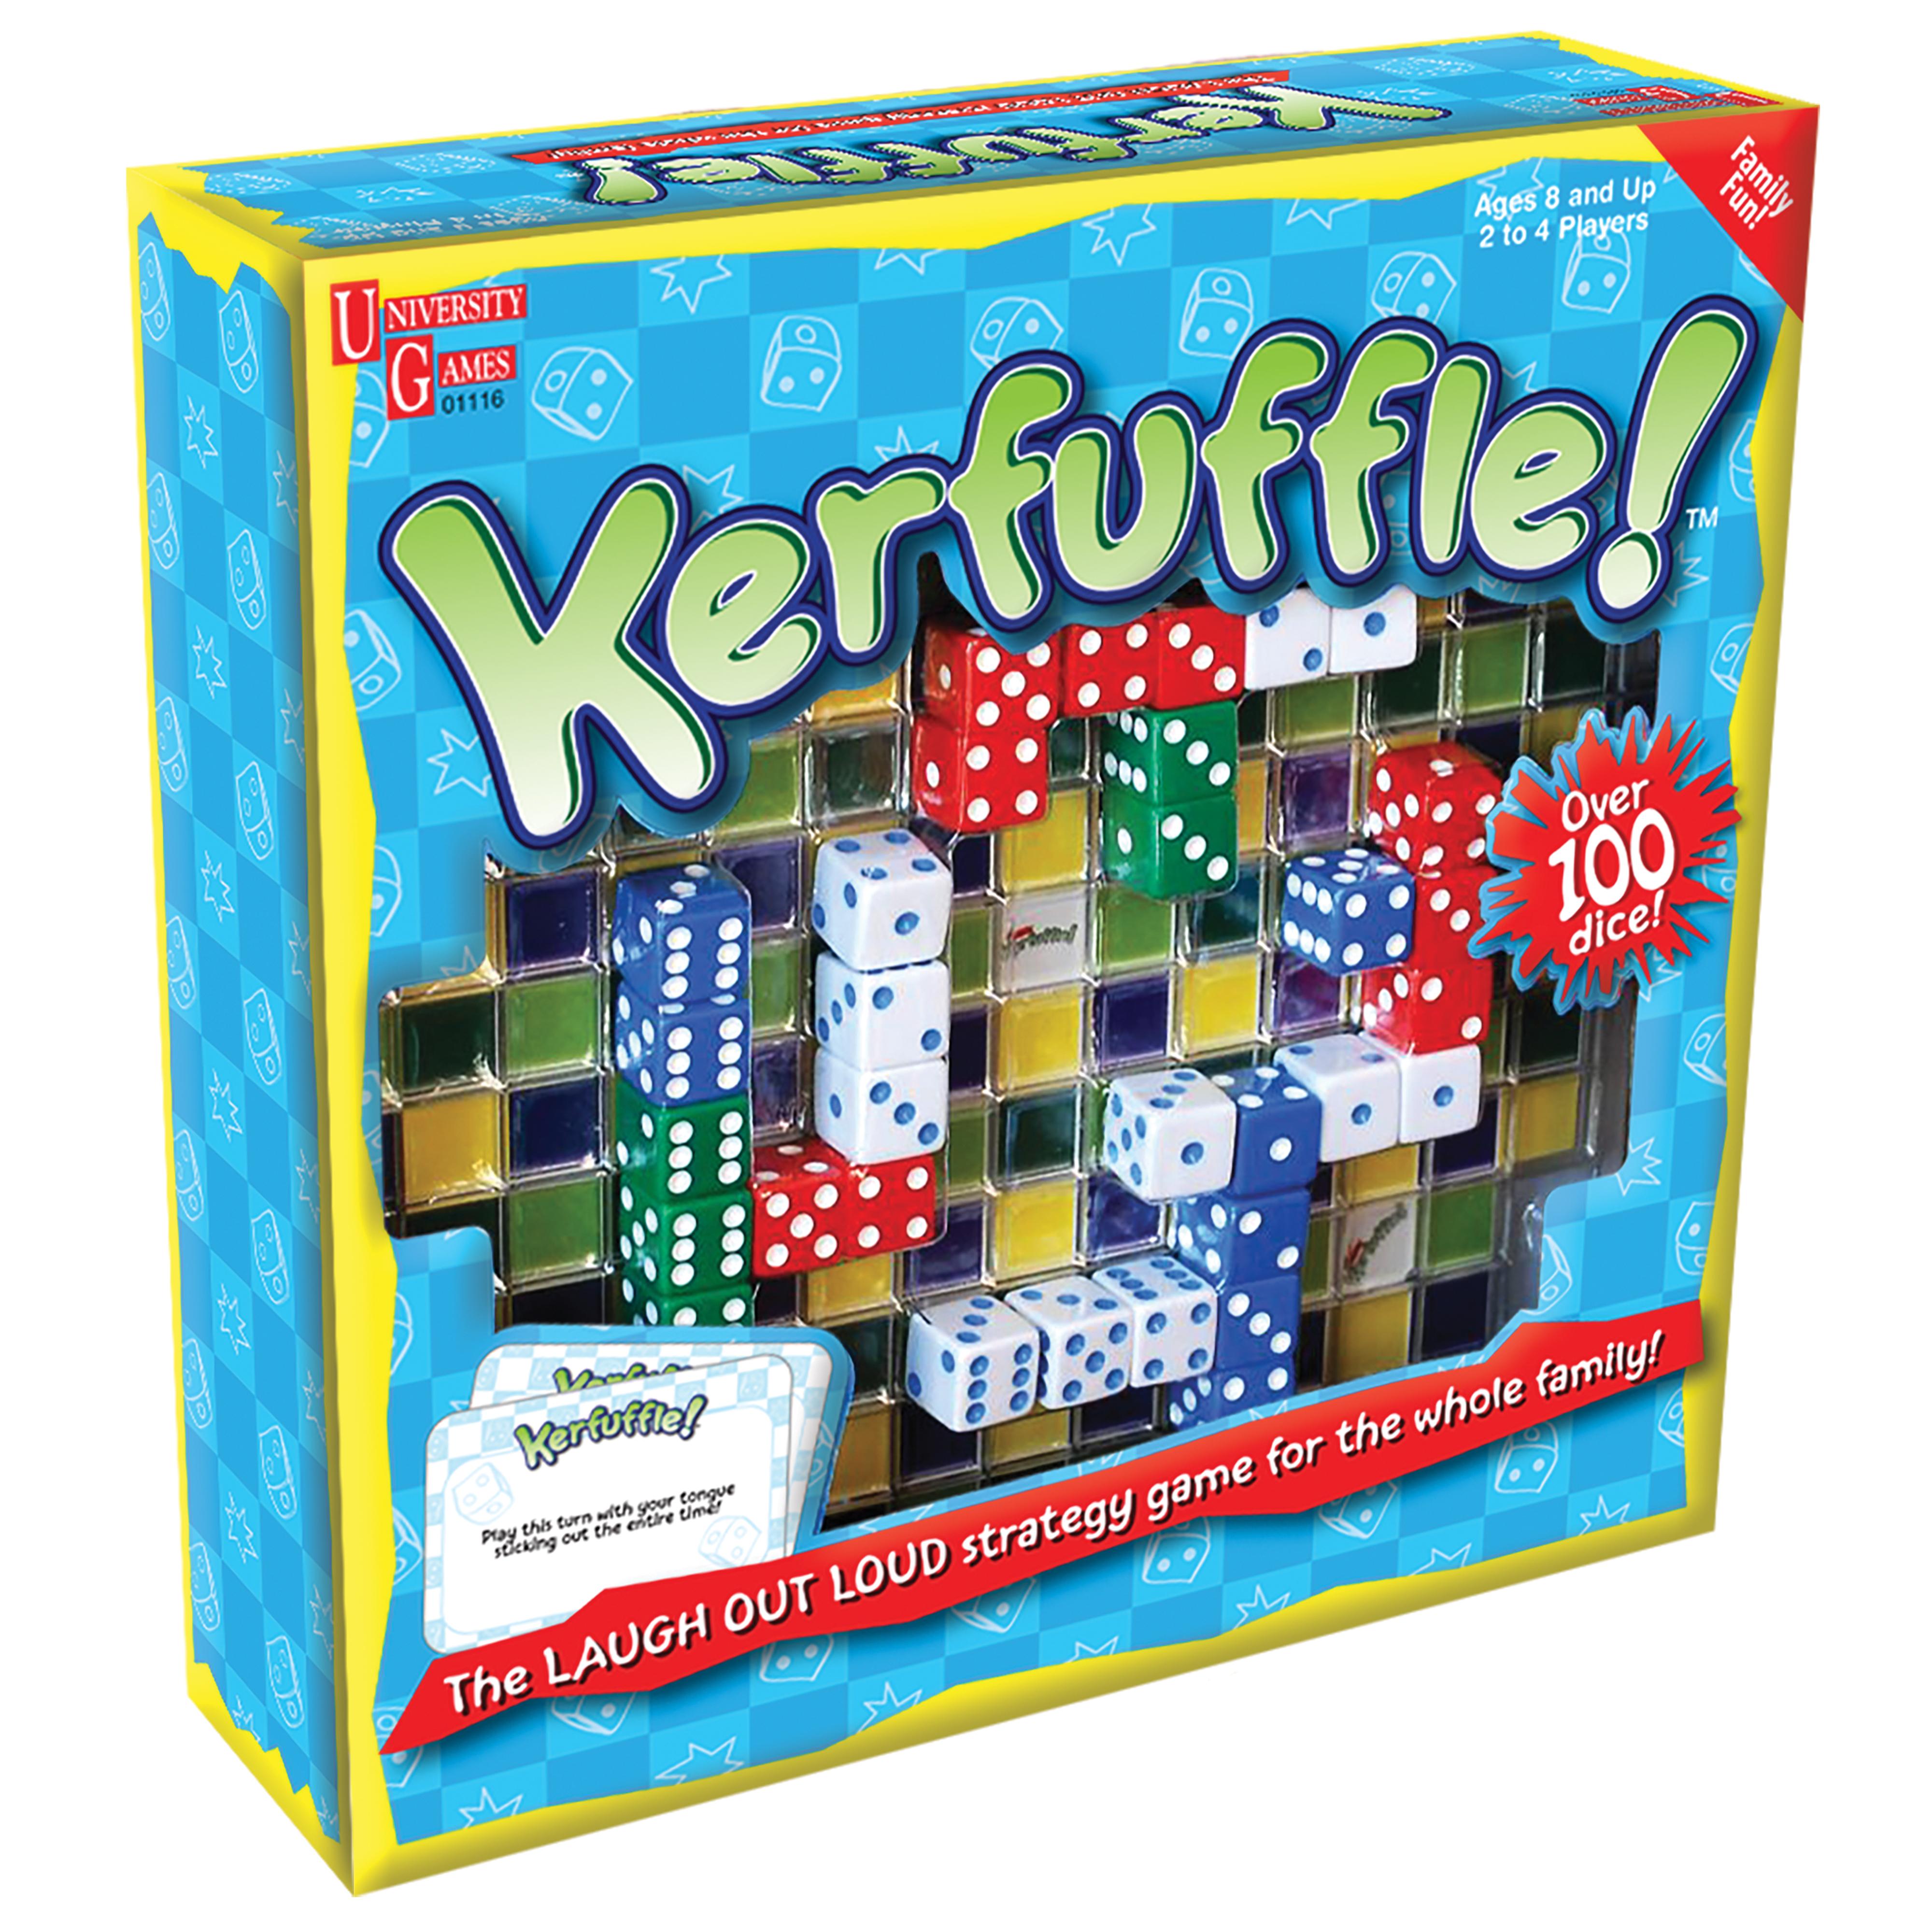 Kerfuffle!